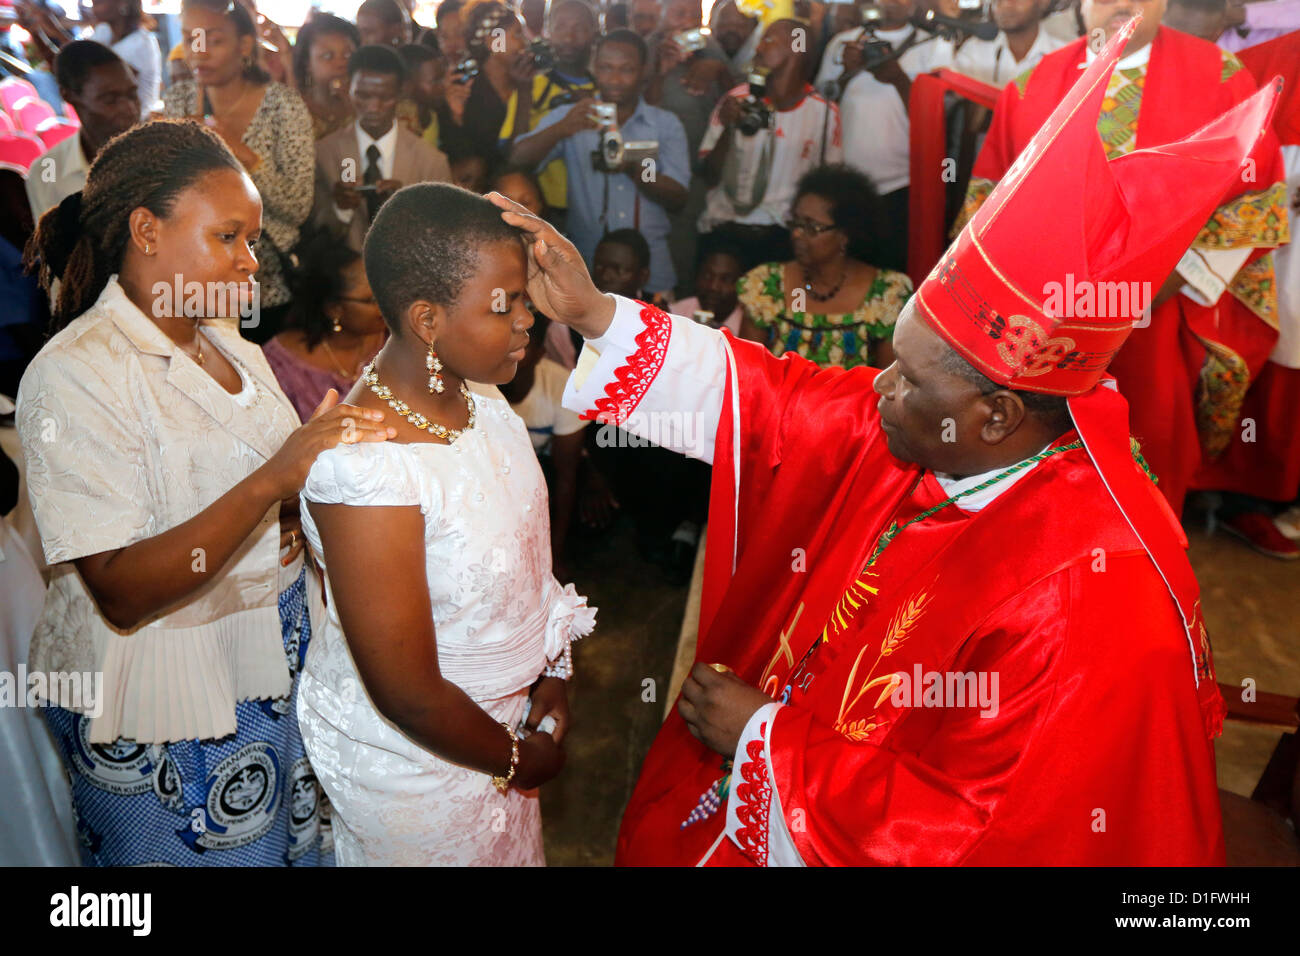 Roman Catholic Bishop Telesphor Mkude of Morogoro Diocese during confirmation ceremony in Bagamoyo, Tanzania - Stock Image